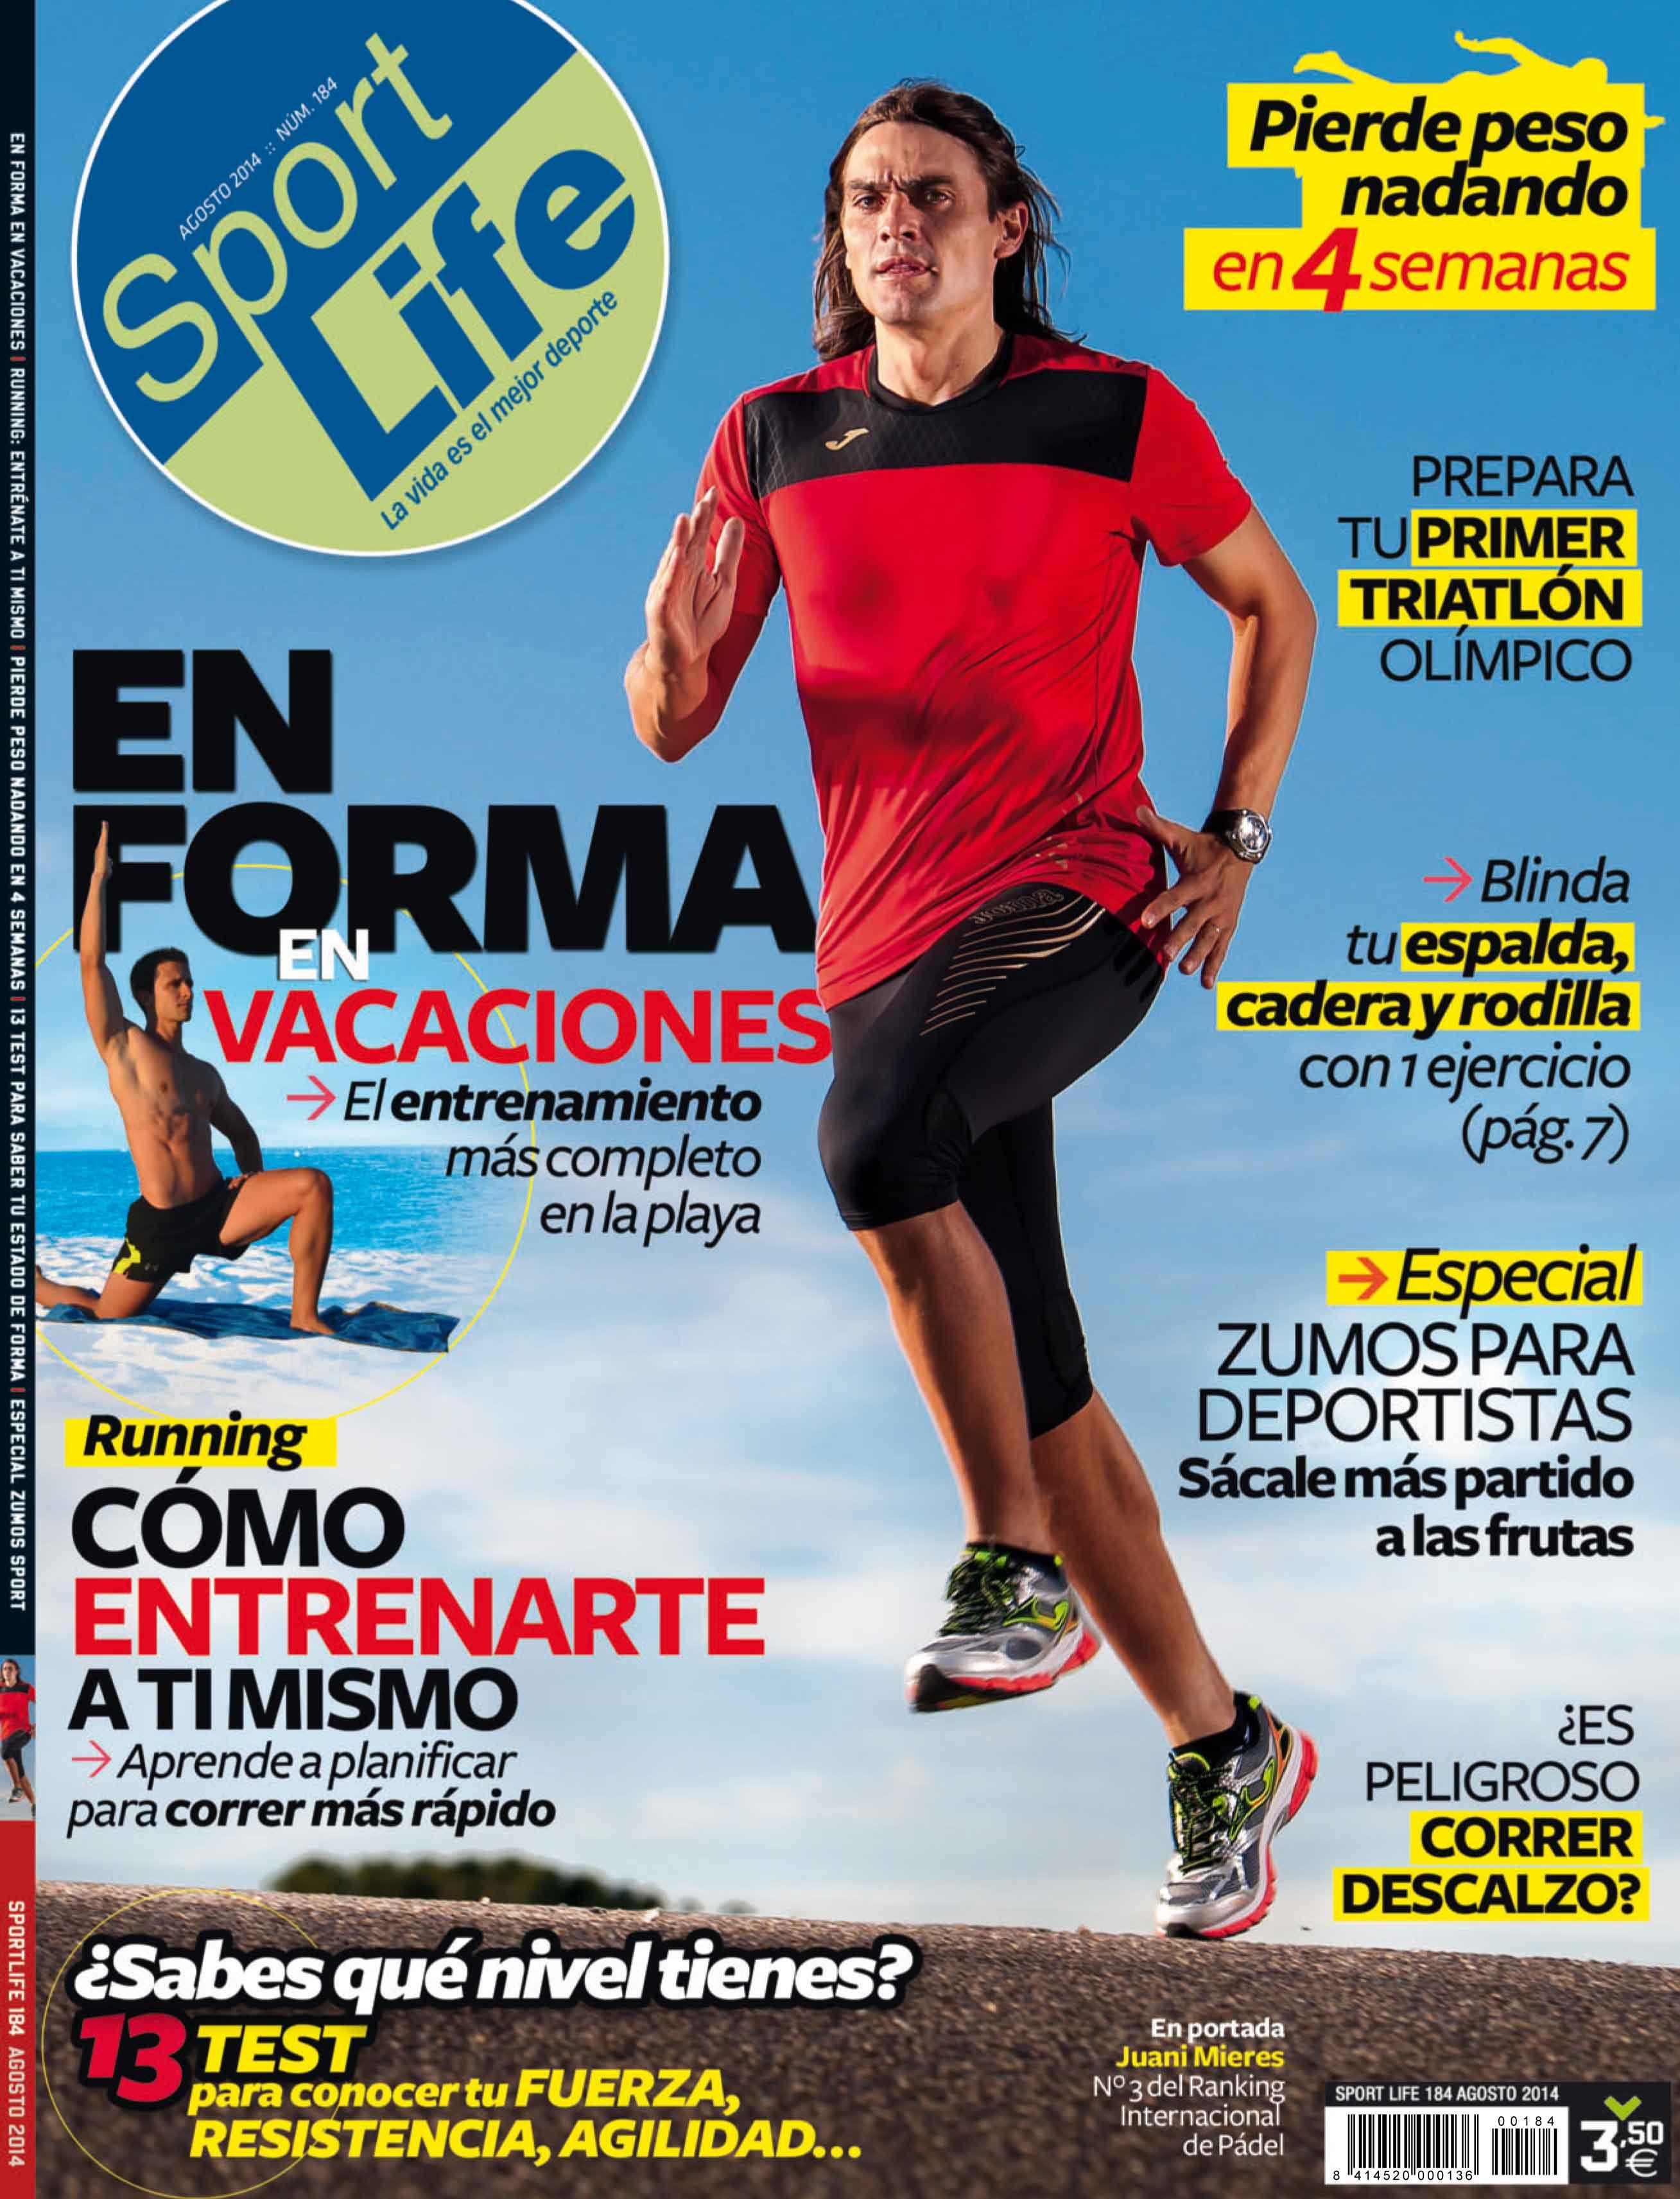 Sumario Sport Life 184 agosto 2014